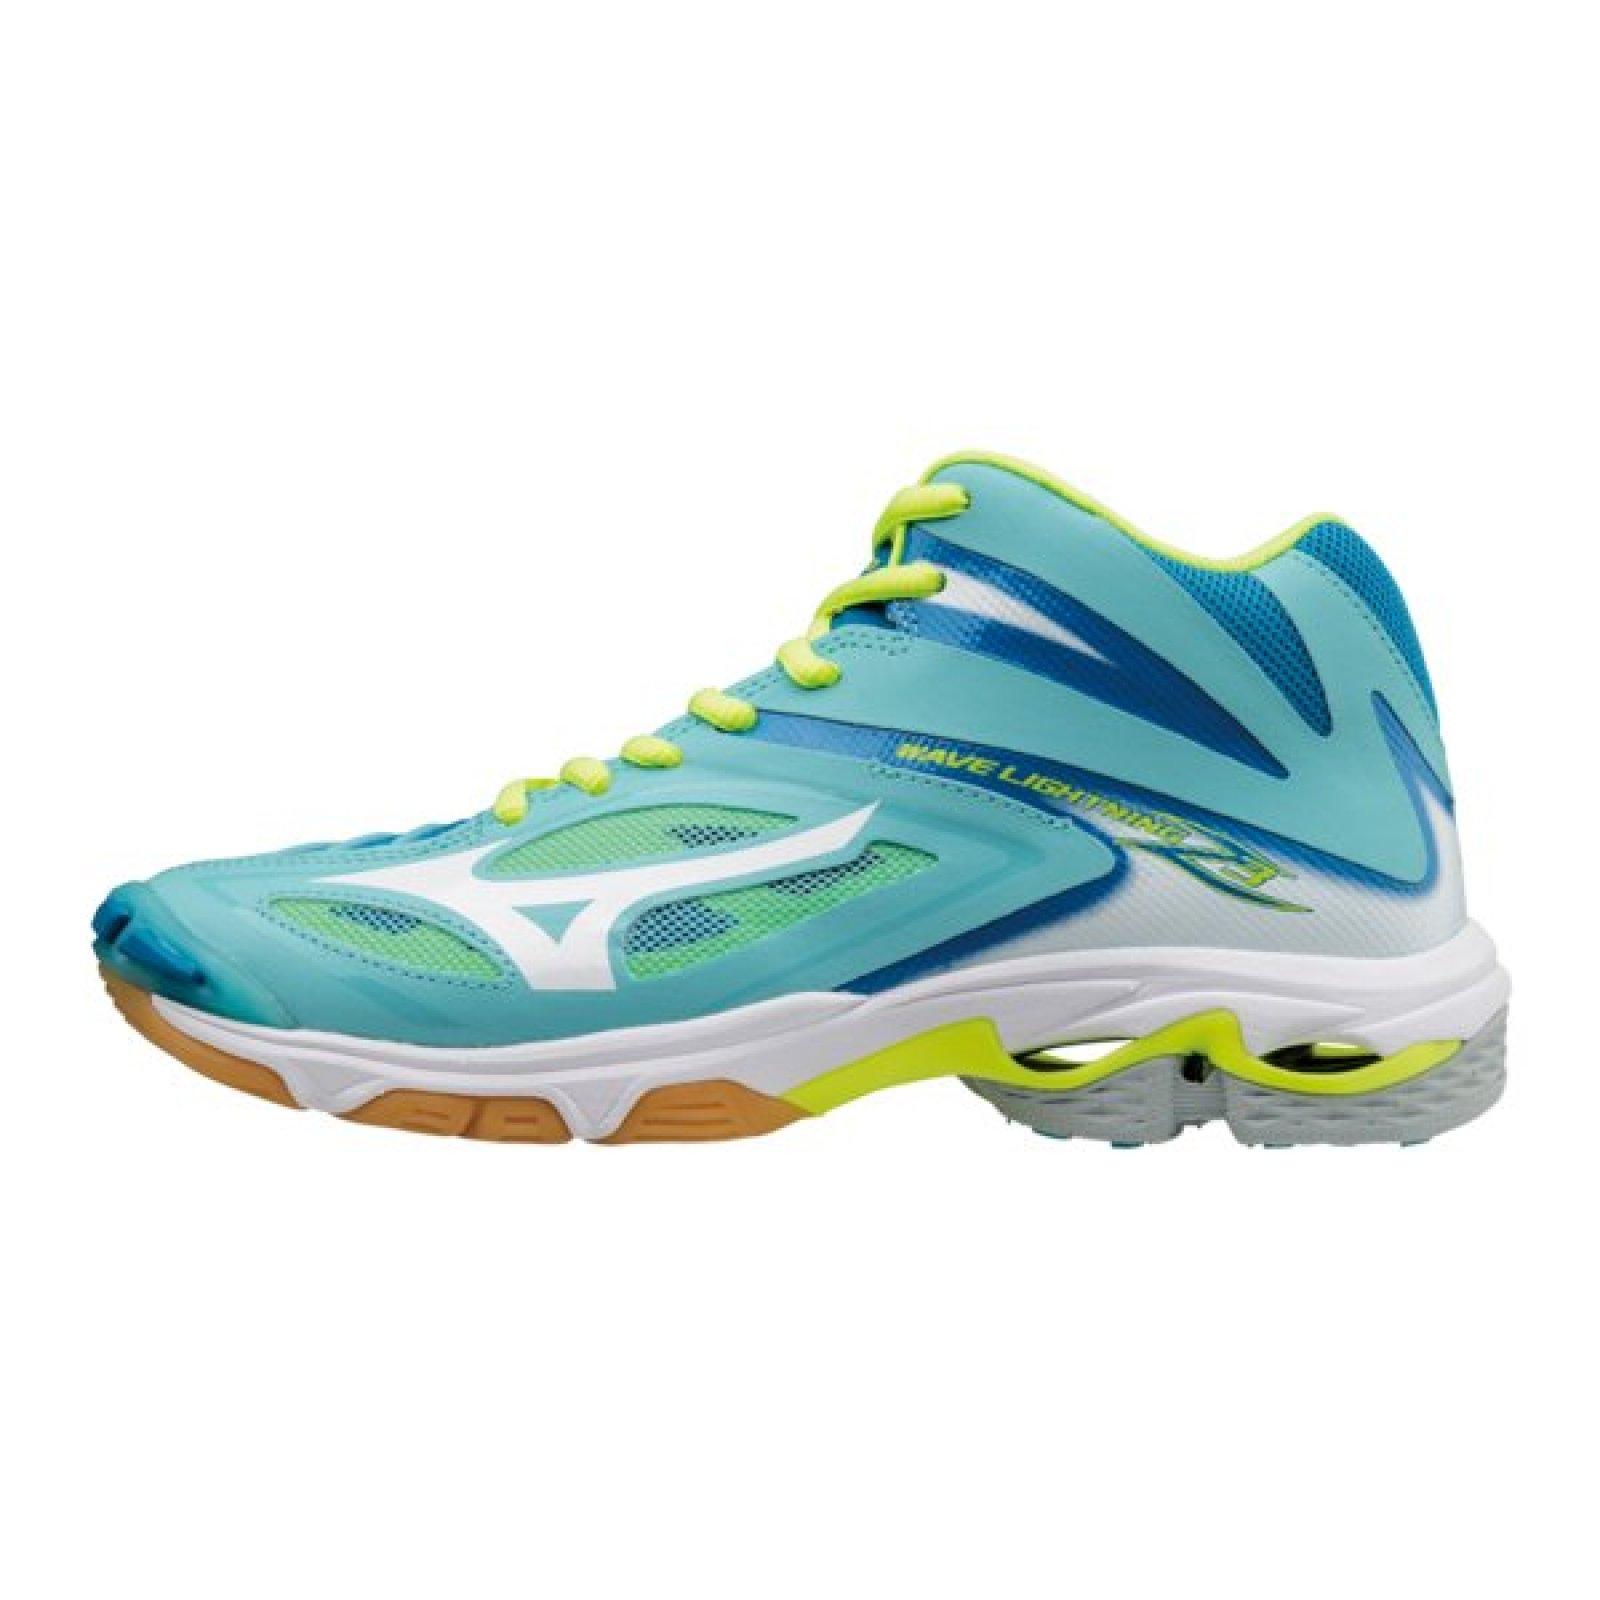 Volejbalové boty Mizuno Wave Lightning Z3 Mid W V1GC170504 ... 097c416c5a